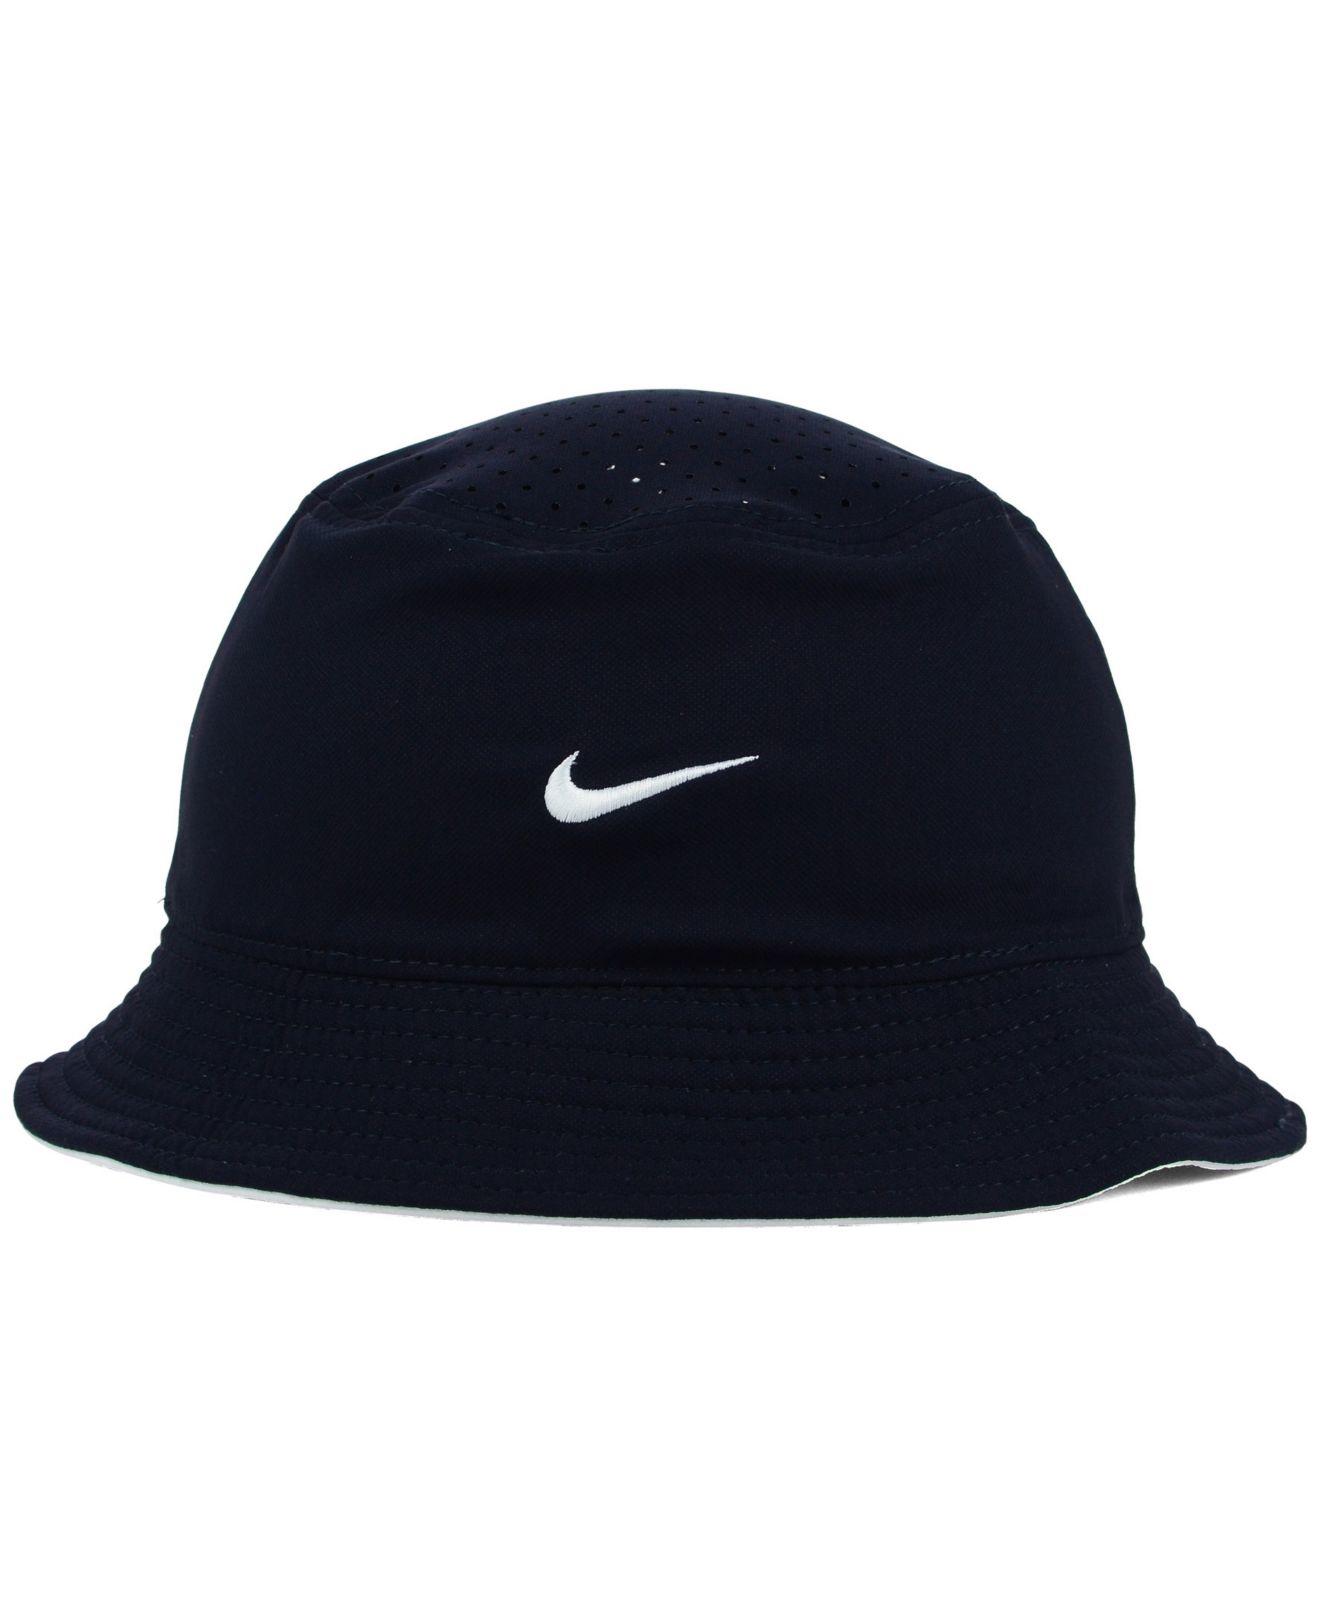 Lyst - Nike New York Yankees Vapor Dri-fit Bucket Hat in Blue for Men 67313dbabd1